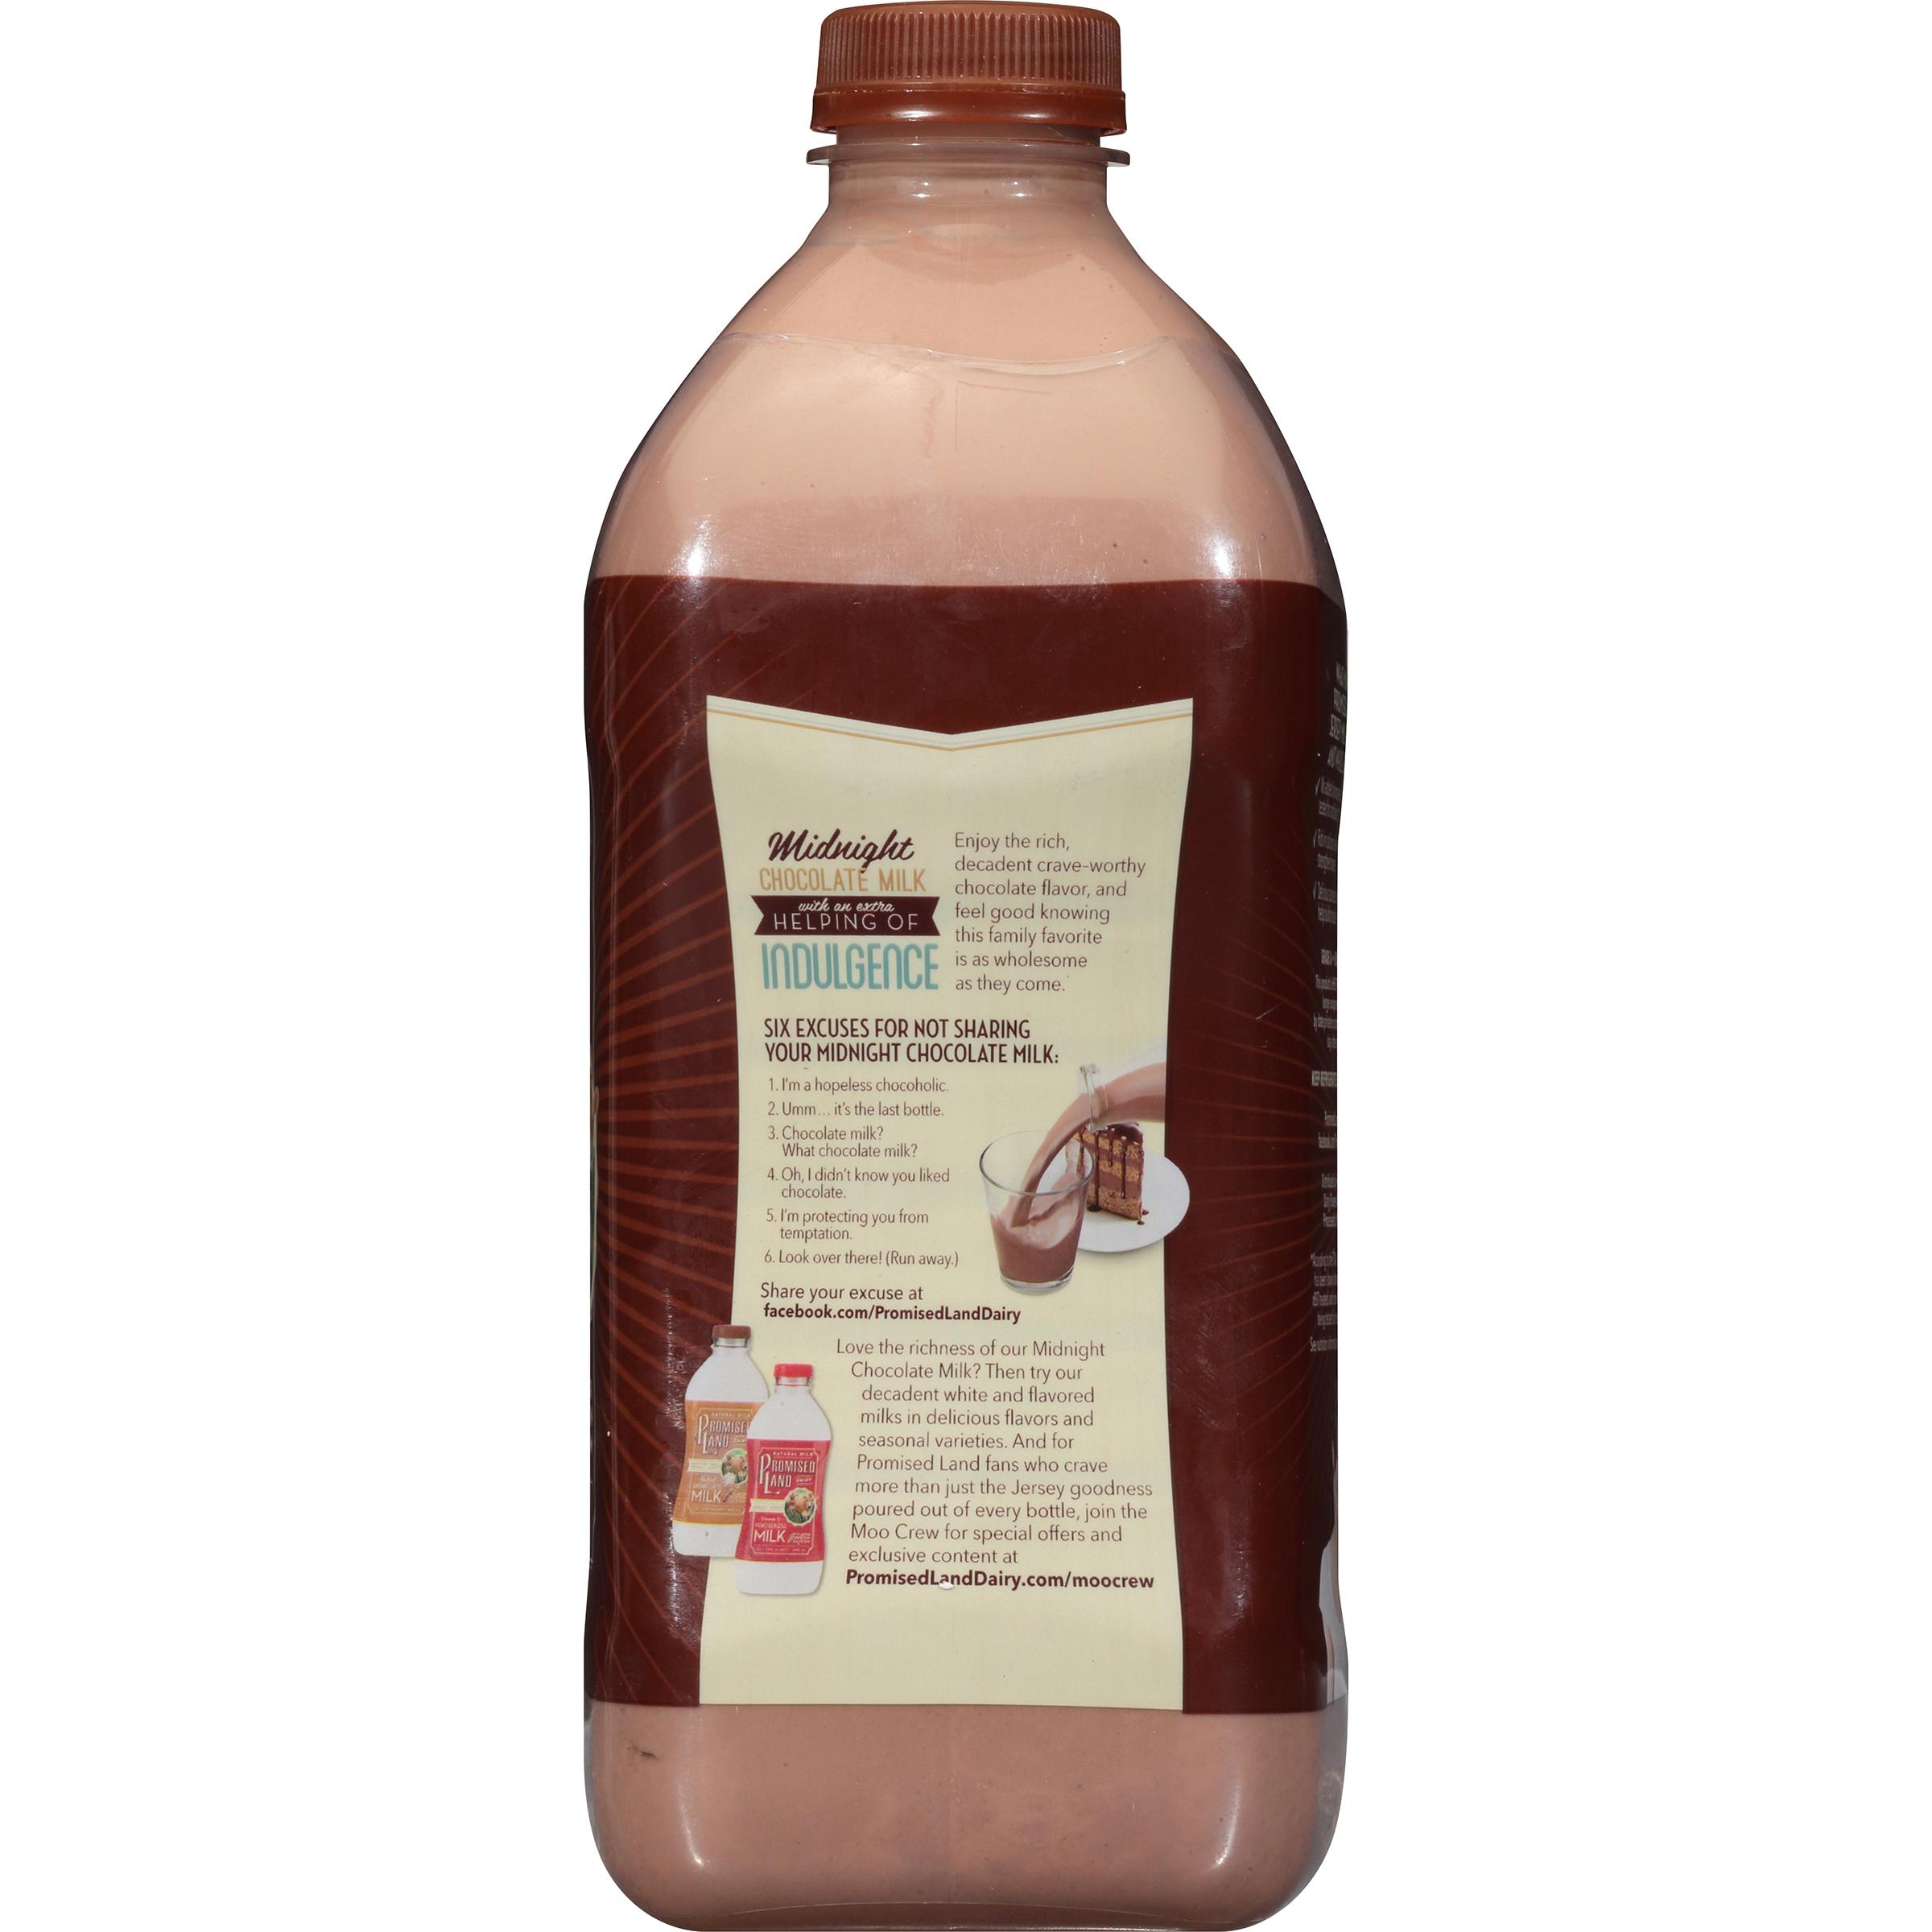 Promised Land Dairy® Midnight Chocolate Milk .5 gal. Bottle ...